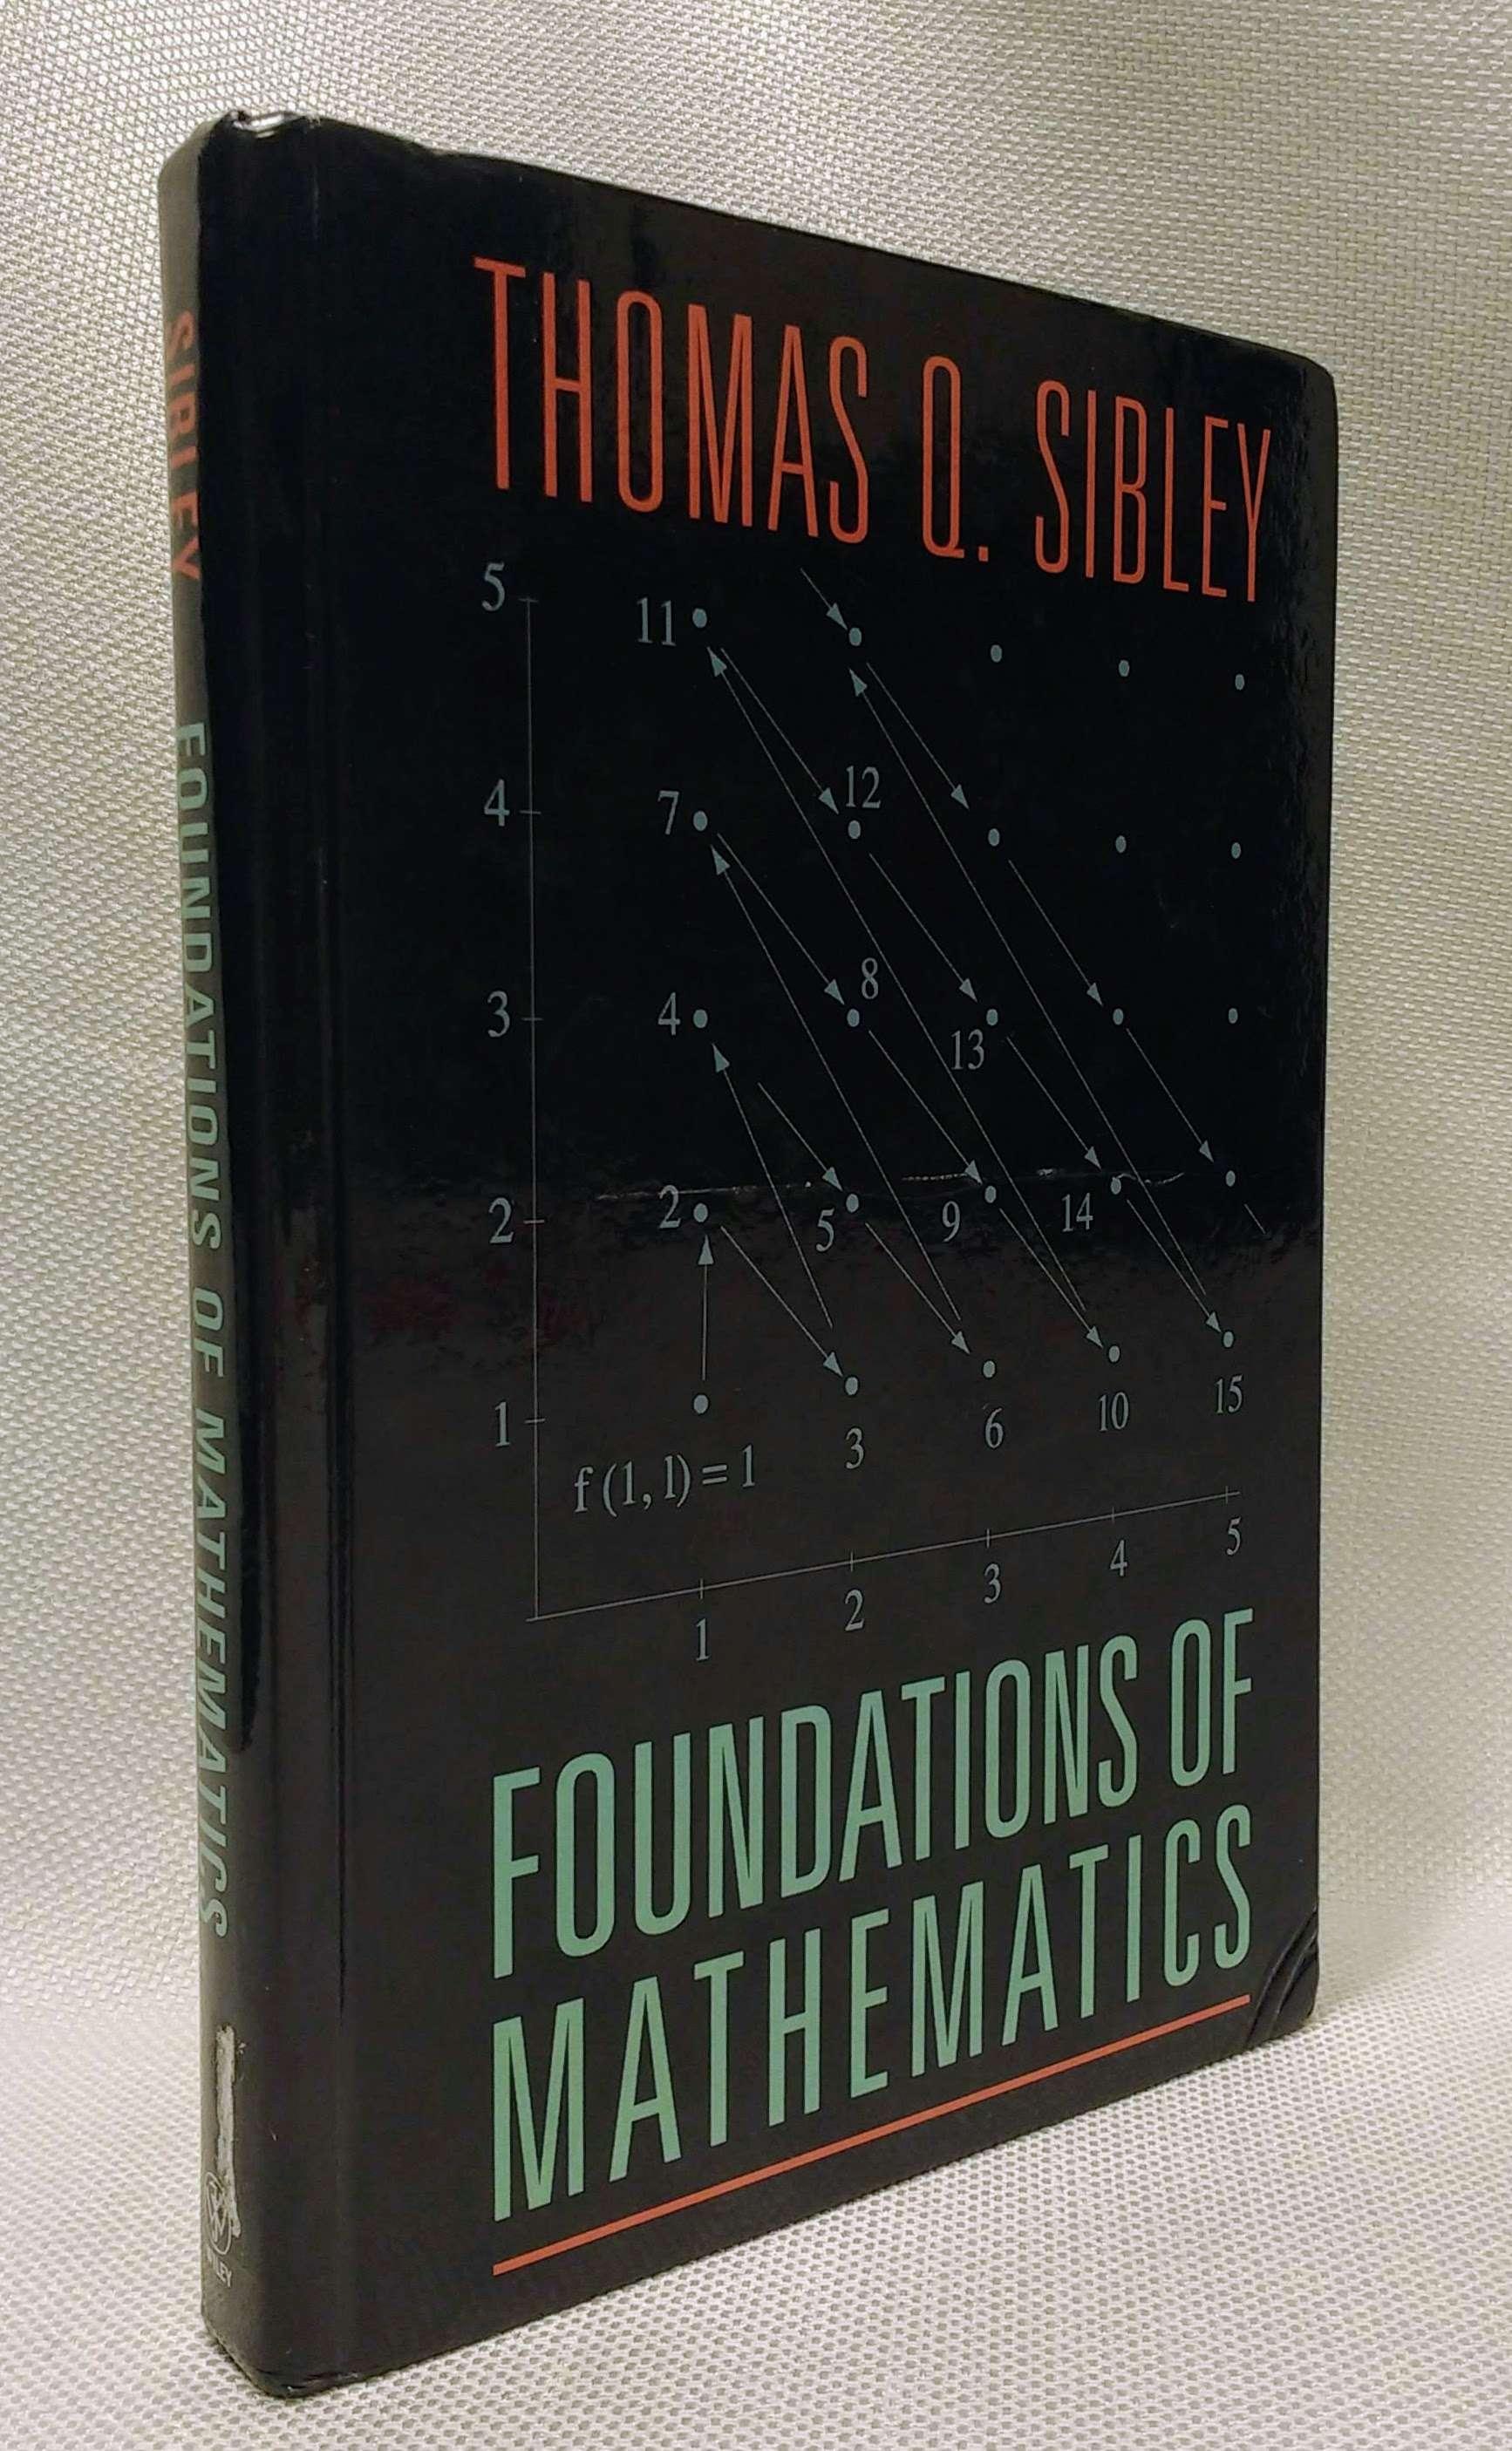 The Foundations of Mathematics, Sibley, Thomas Q.